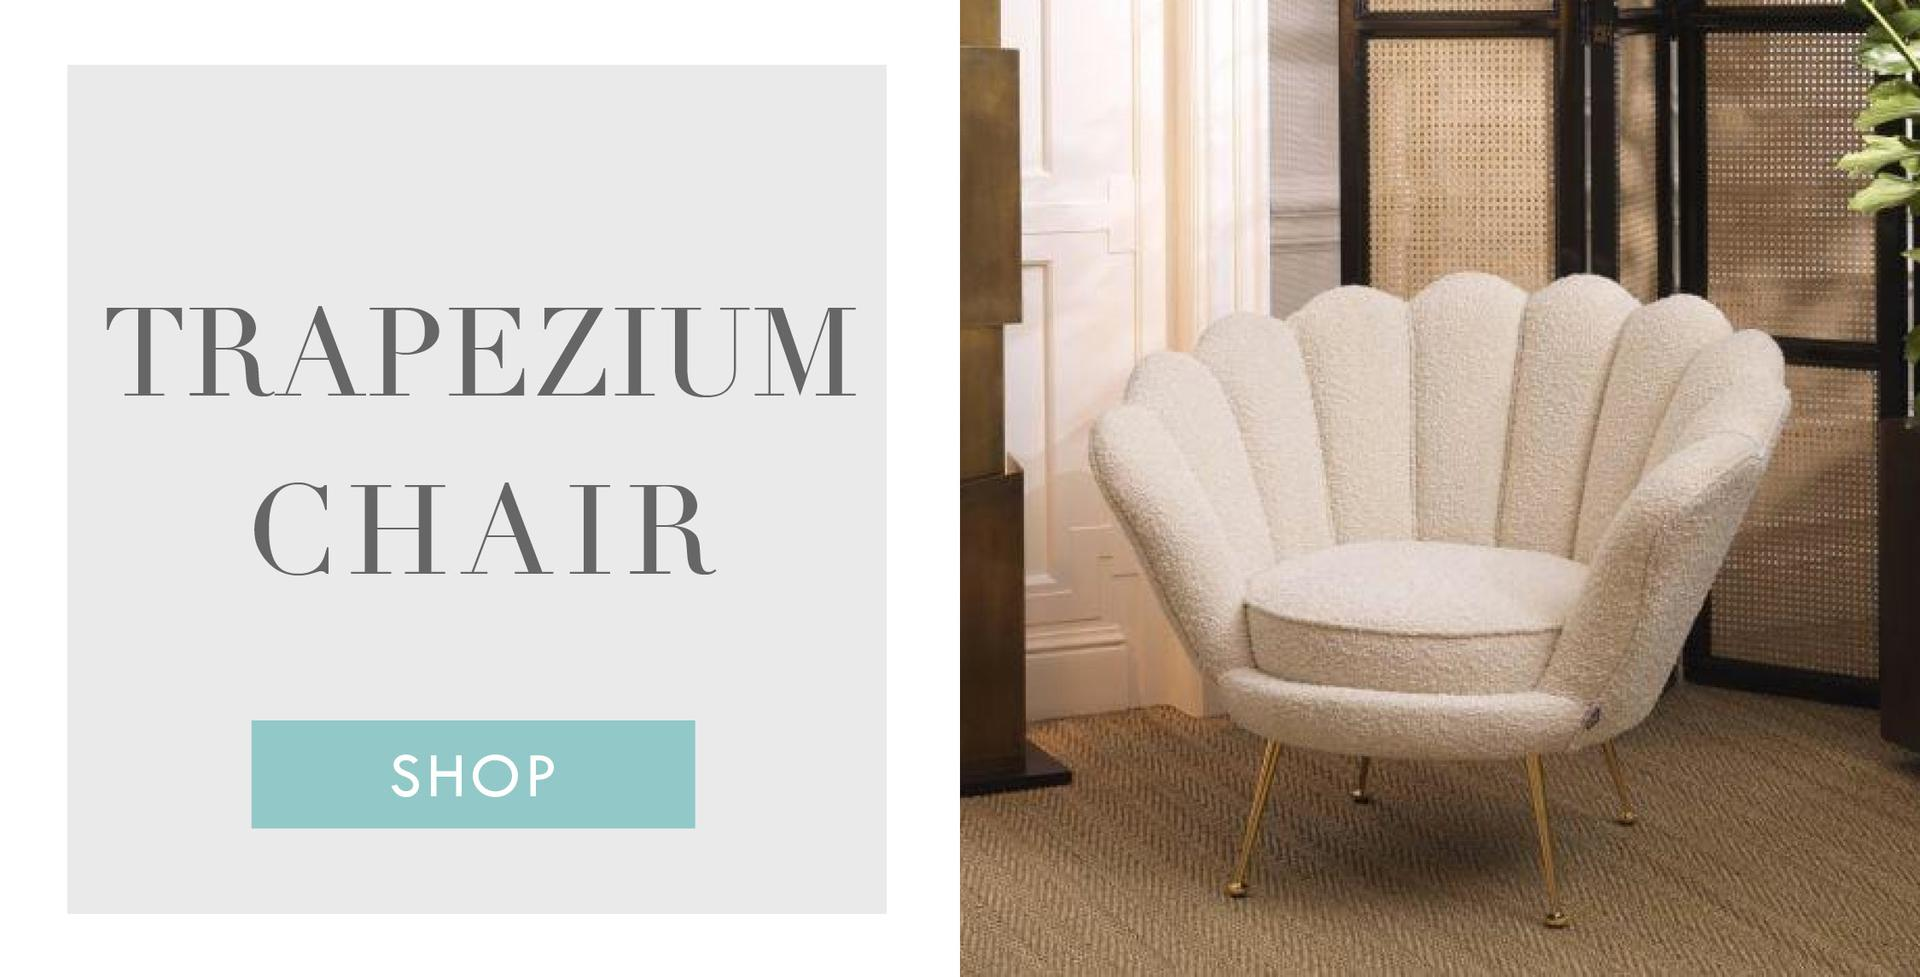 Shop the Trapezium Chair